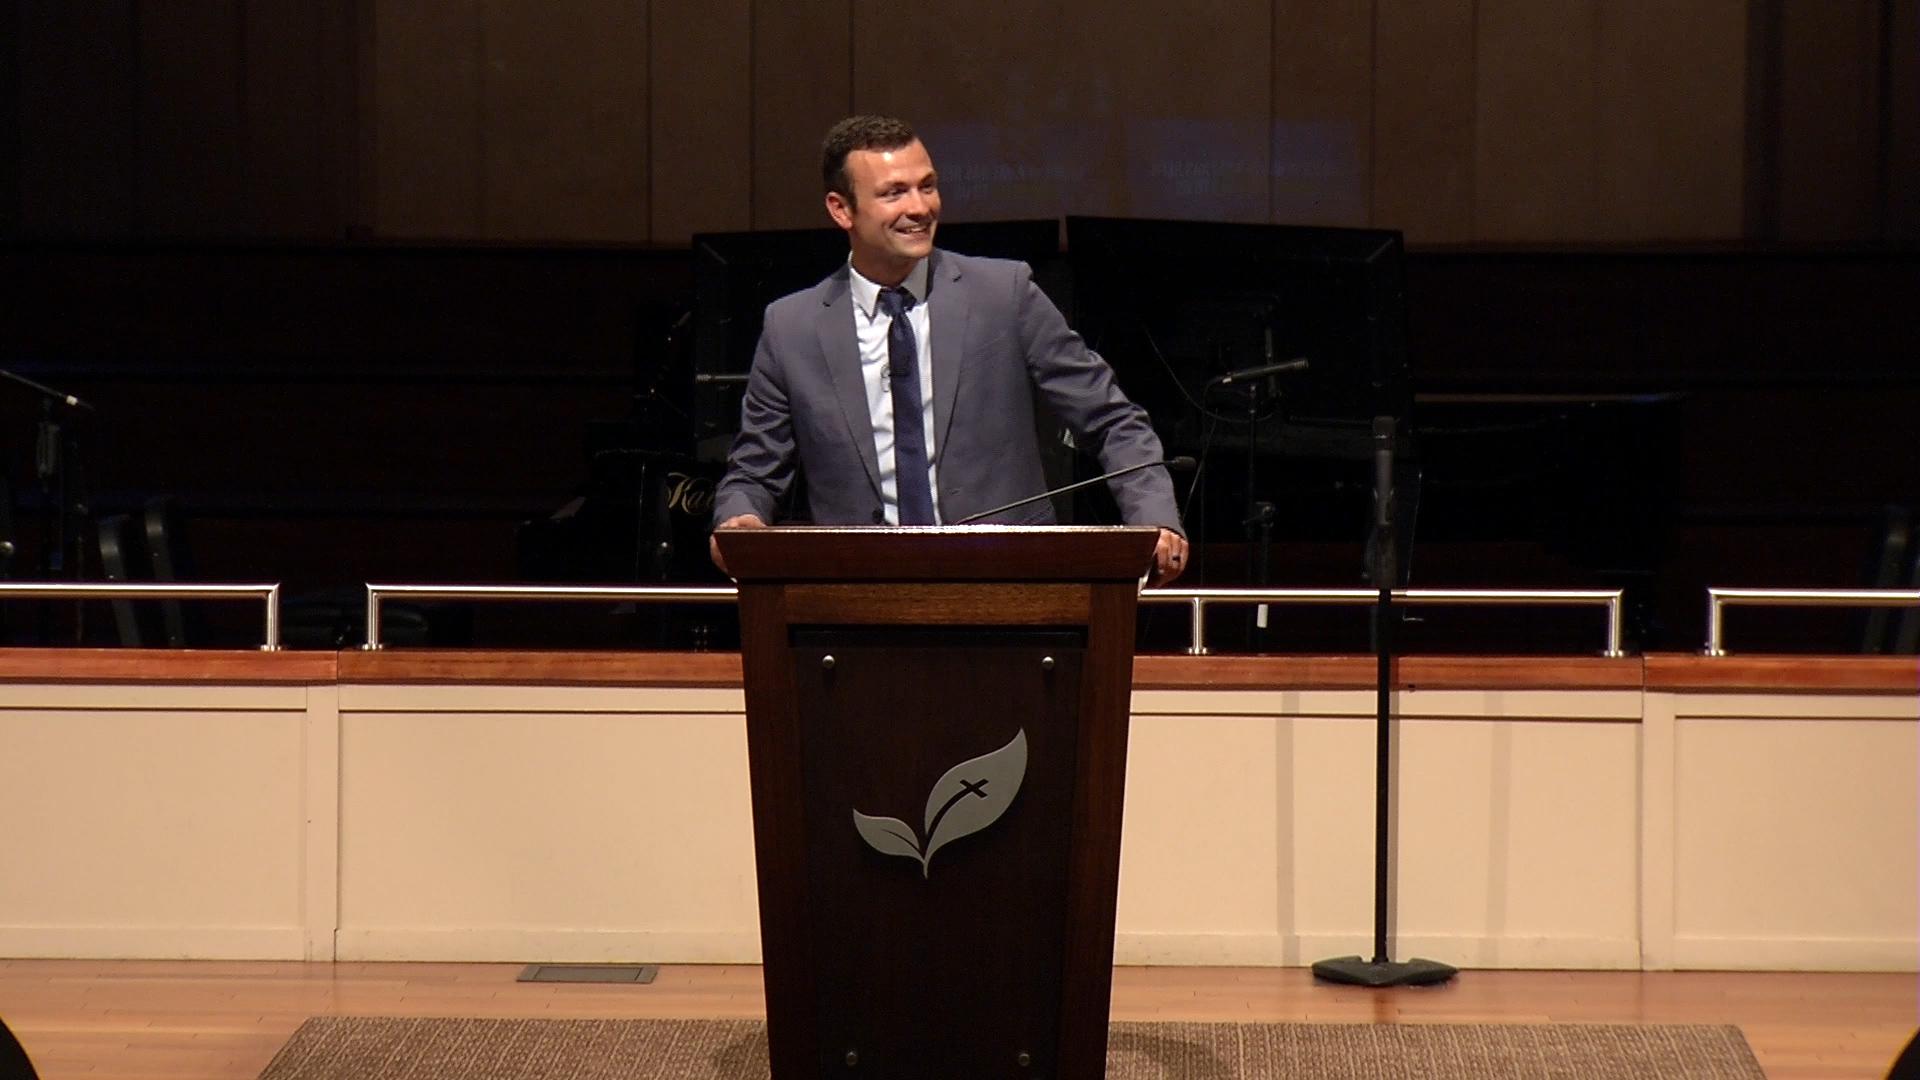 Dave Delaney: Motivations for Christian Living